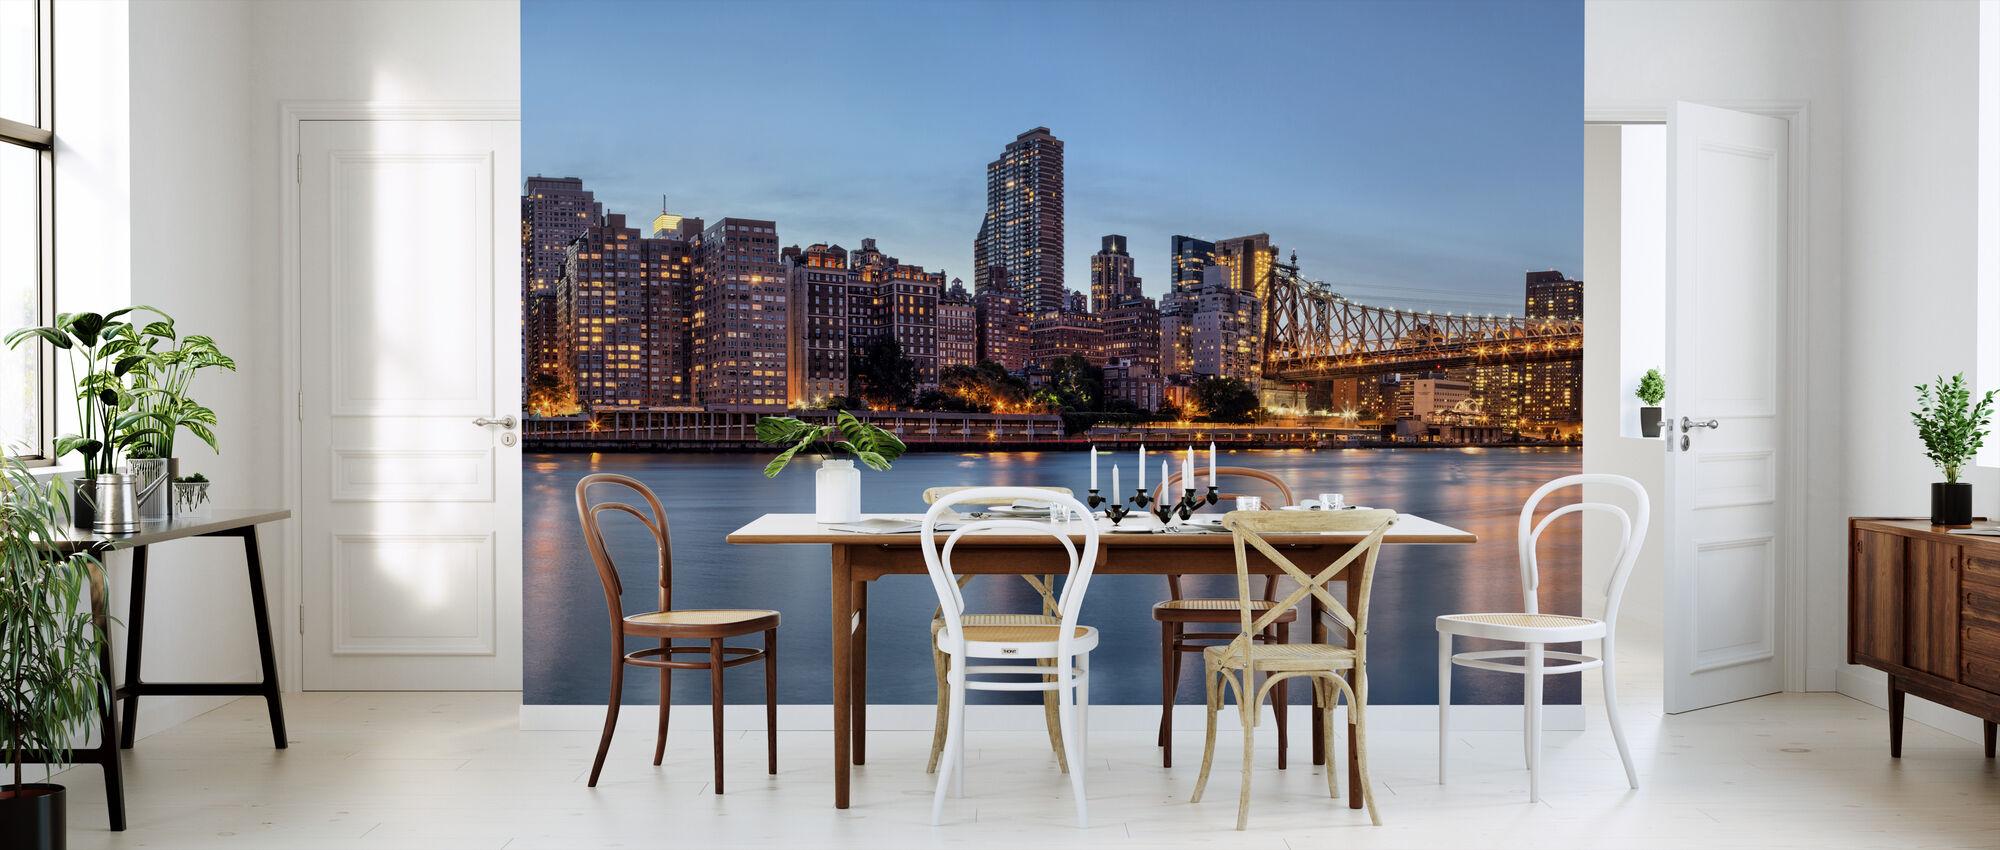 New York Panorama at Dusk - Wallpaper - Kitchen